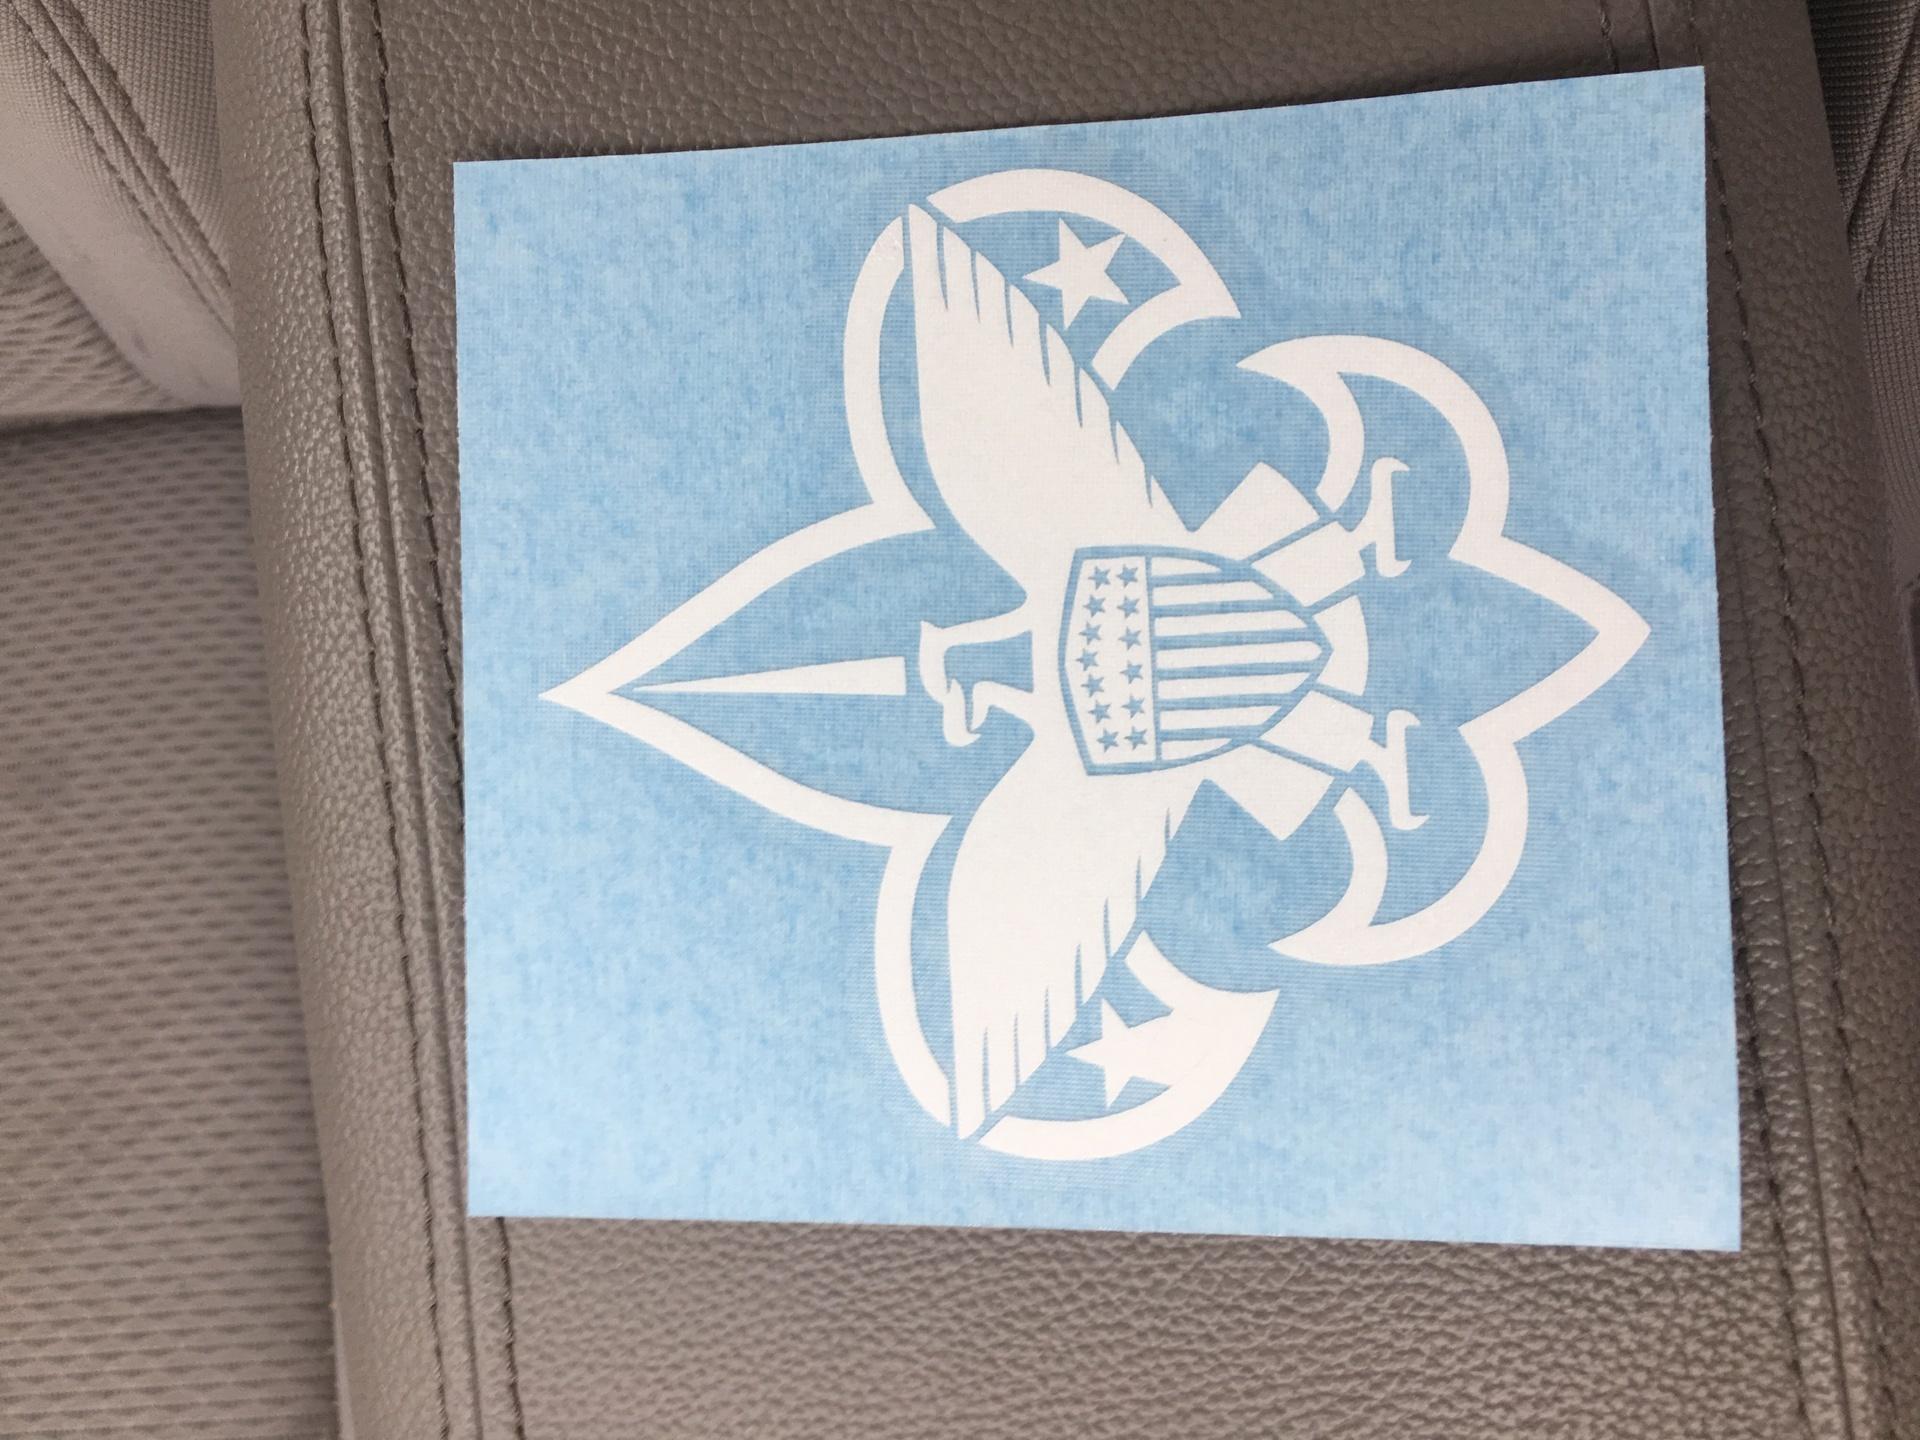 Daniel's photograph of their Boy Scouts Logo Eagle Sticker